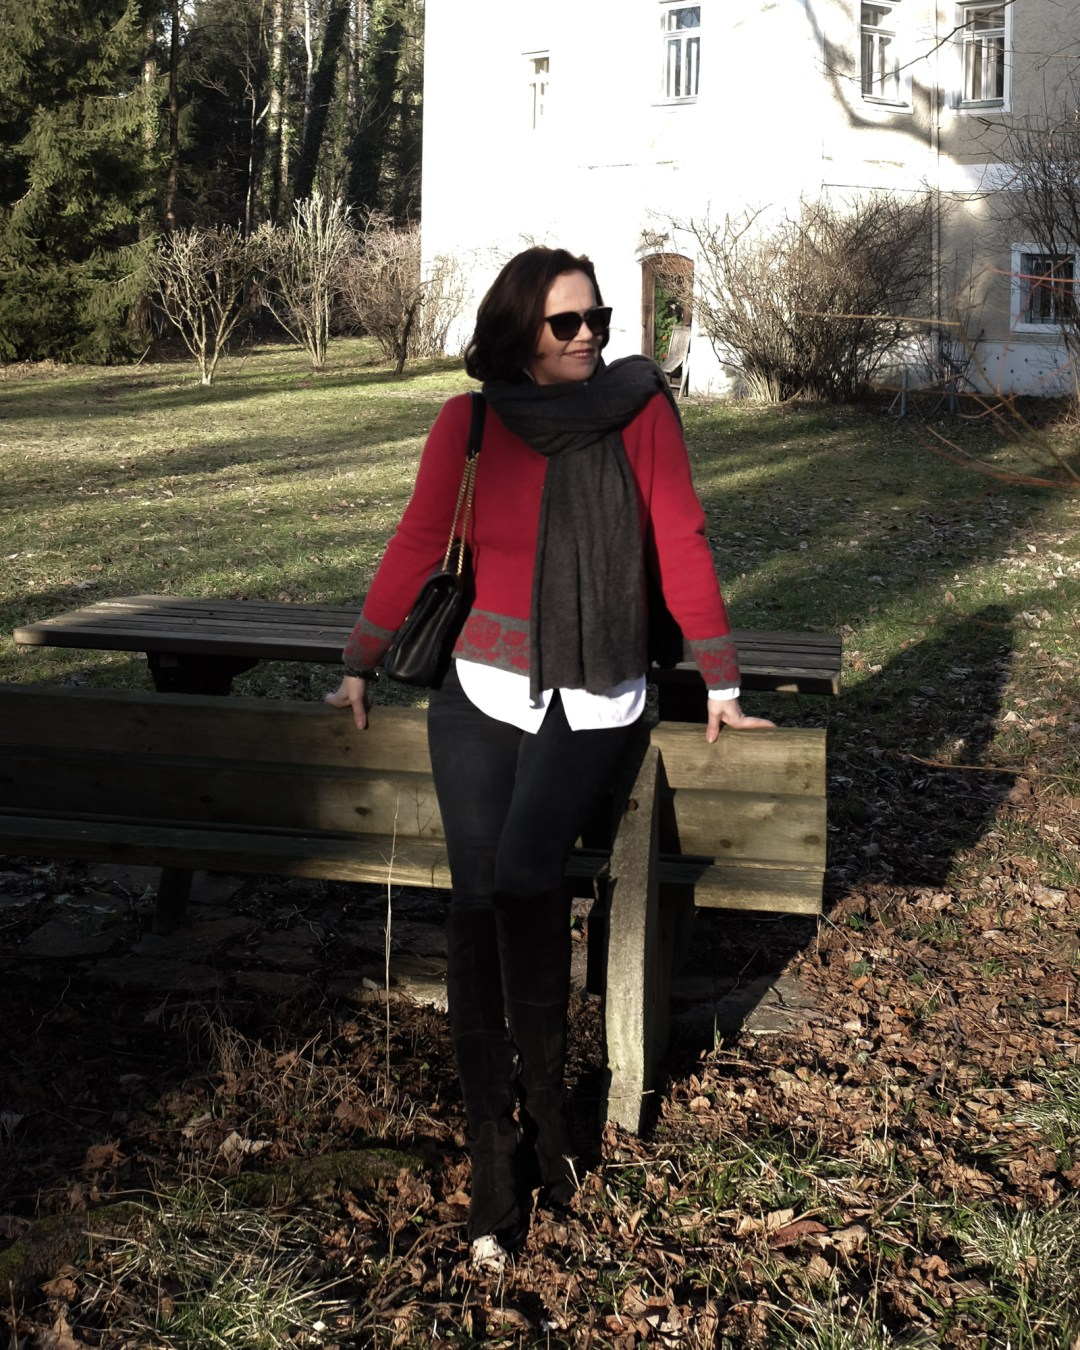 inastil, outfit, stilberatung, ü50style, Modeberatung, klassisches Outfit, Modeü40, Trachtenmode, Landhausstil, Ü50Blogger-11